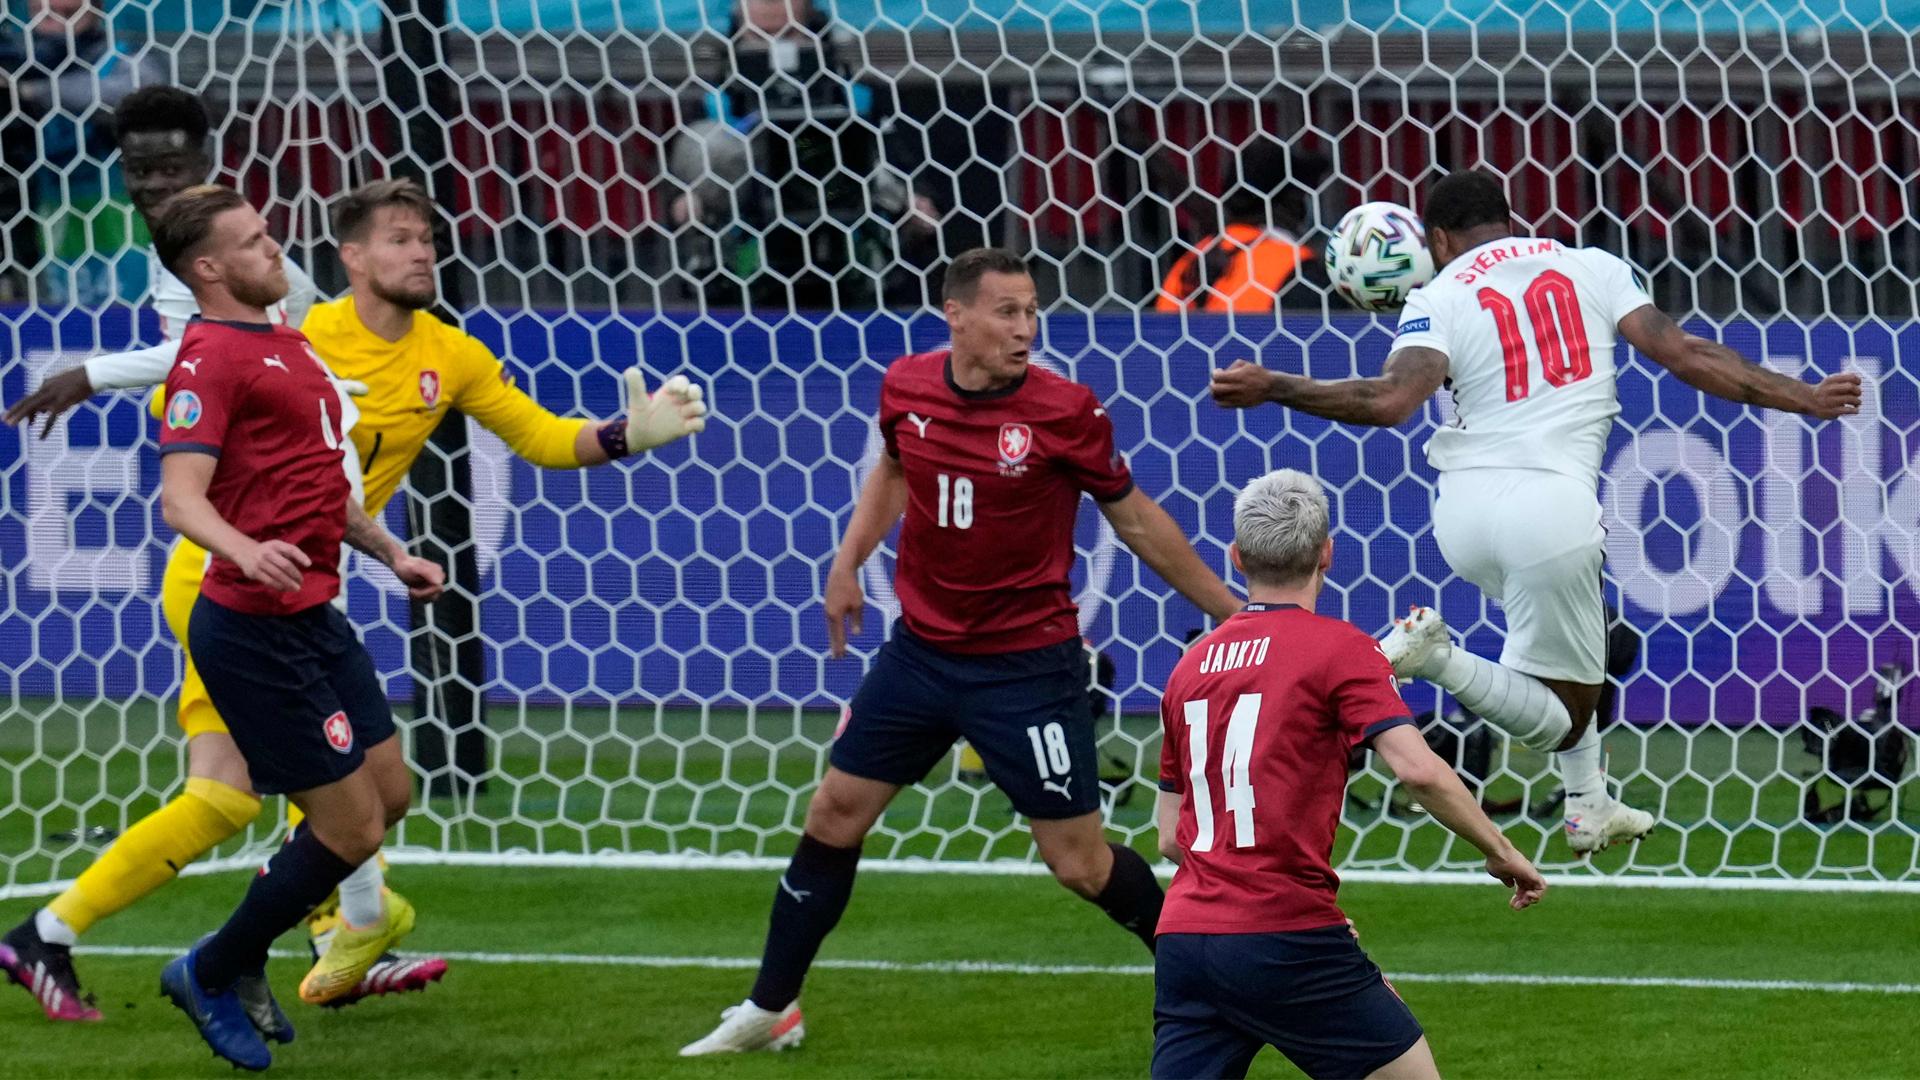 Euro 2020: England 1-0 Czech Republic